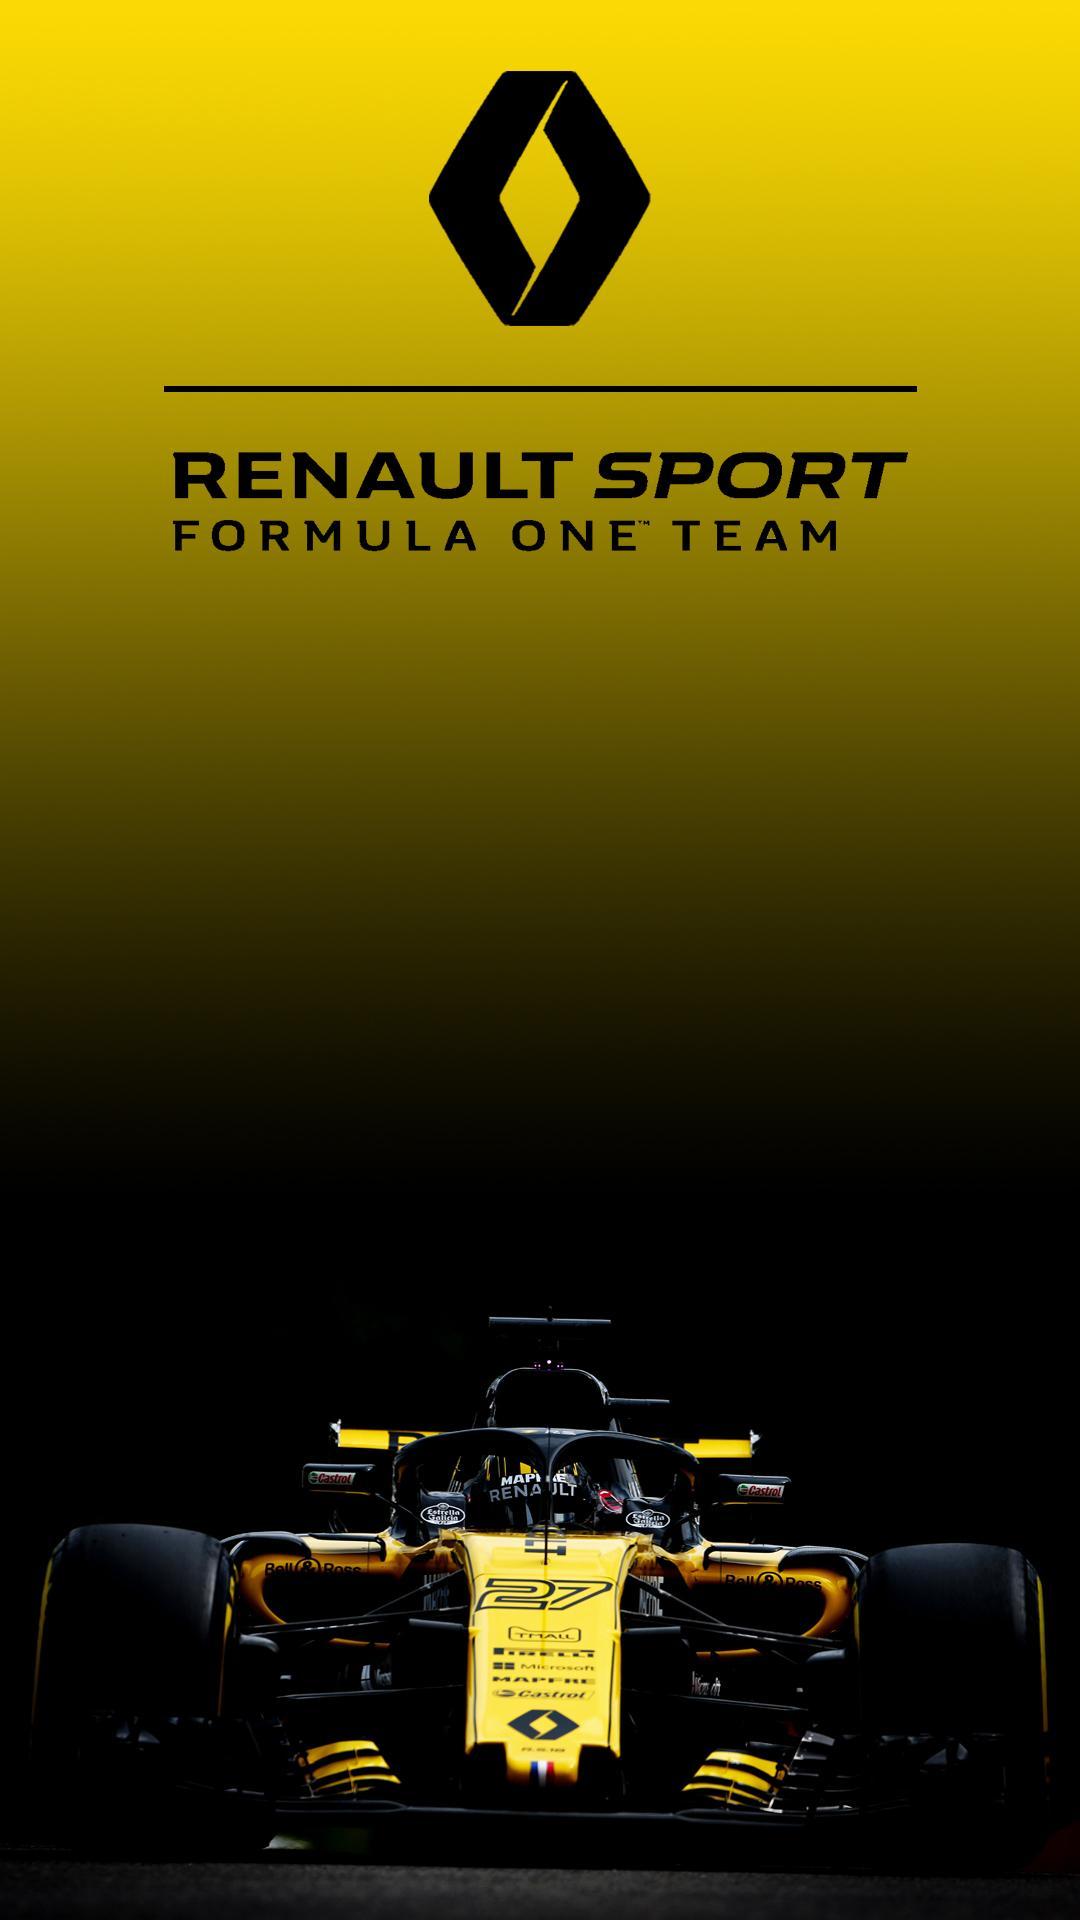 Renault F1 Wallpaper Phone 1080x1920 Wallpaper Teahub Io